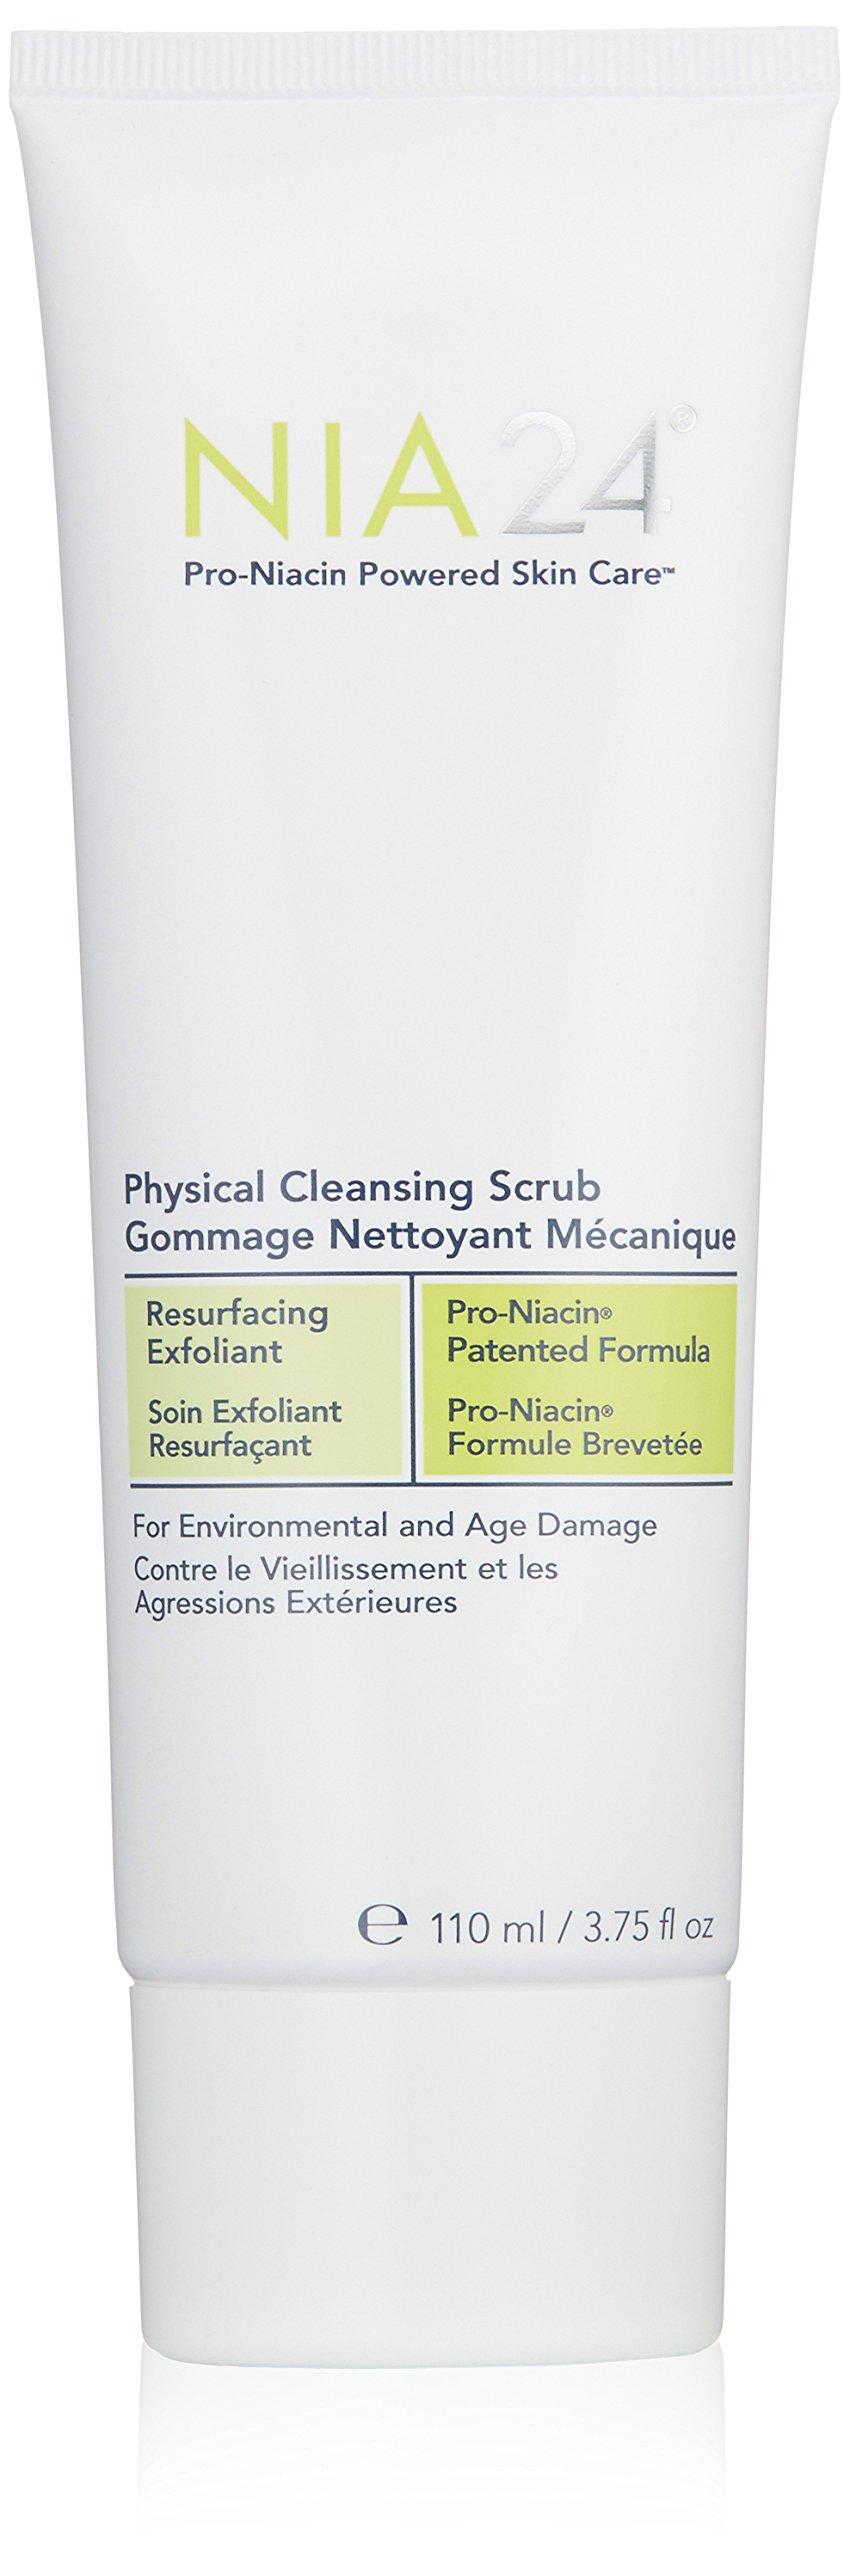 Nia24 Physical Cleansing Scrub, 3.75 Fluid Ounce by Nia 24